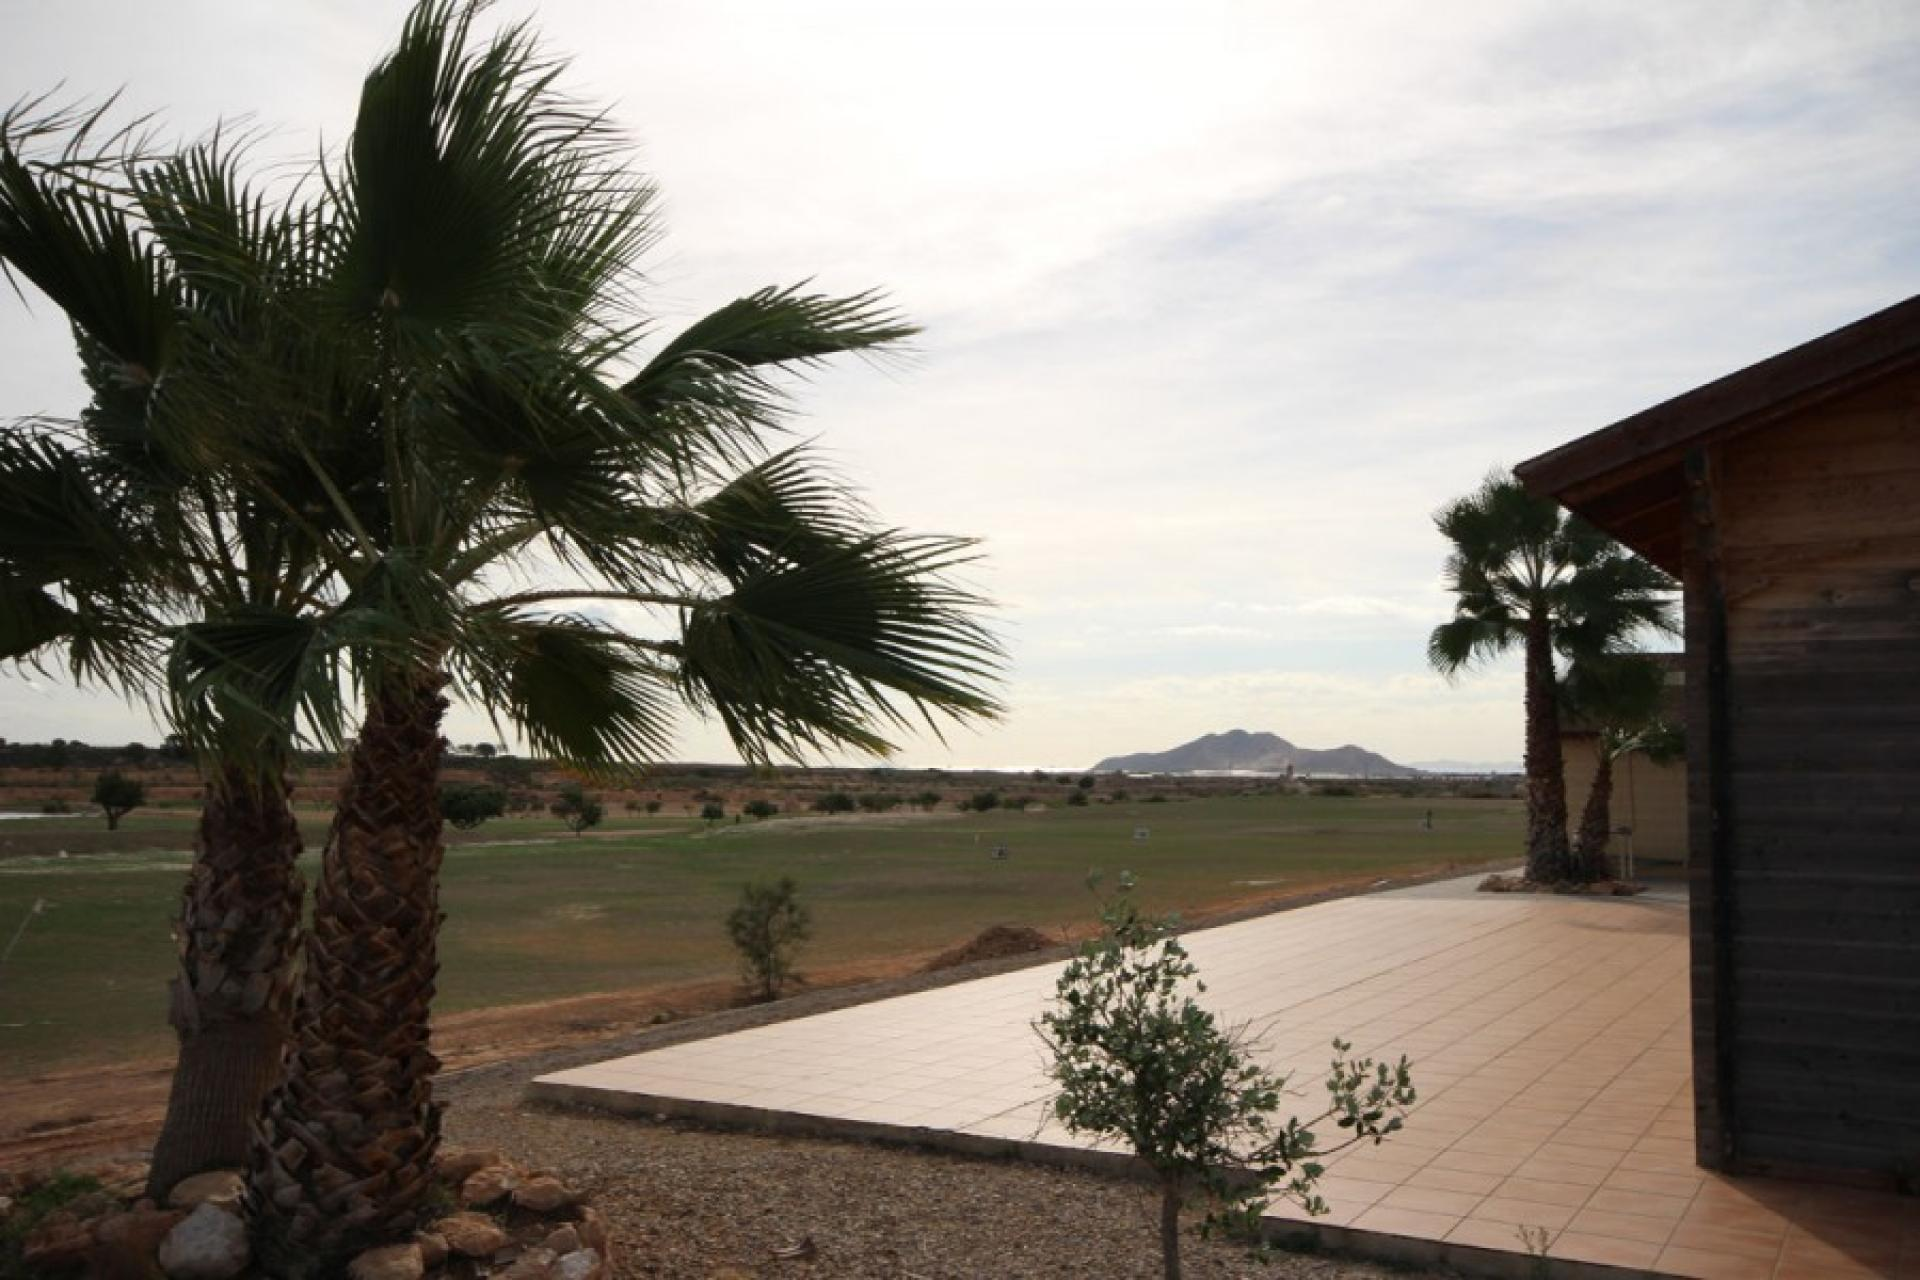 Sierra golf - Balsicas (Costa Calida - Murcia)